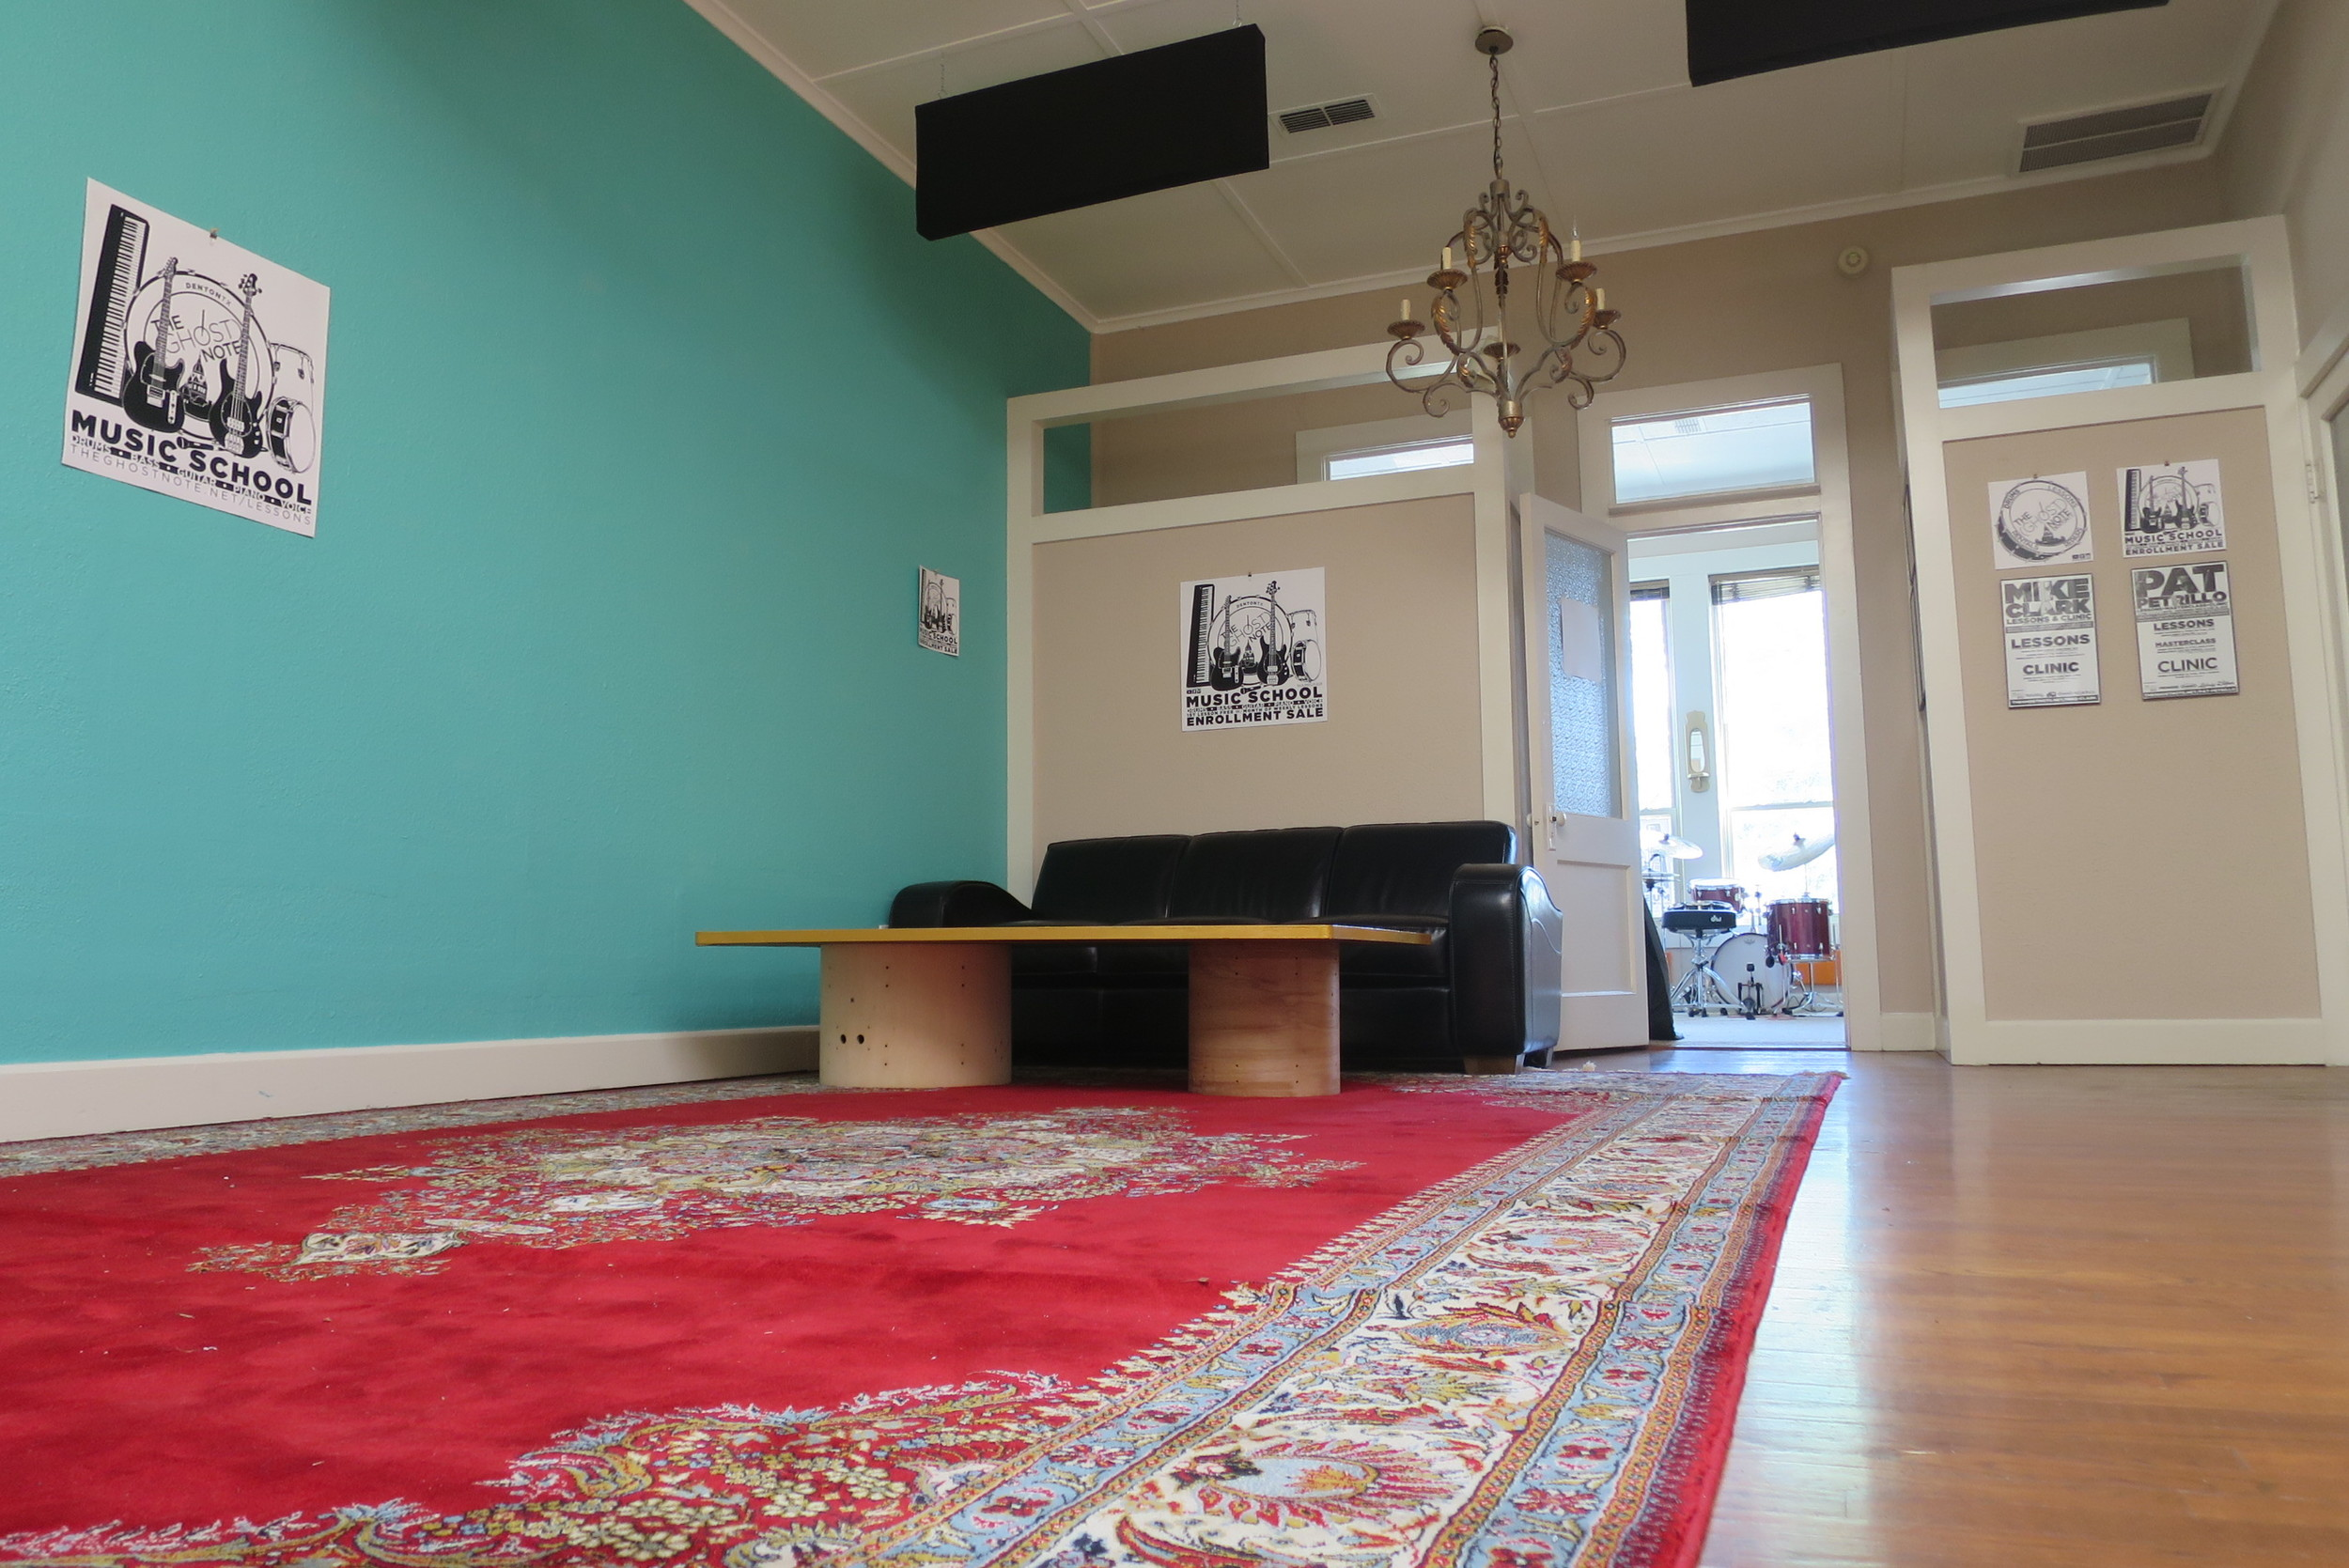 Music School Waiting Room with RUG IMG_5873.JPG